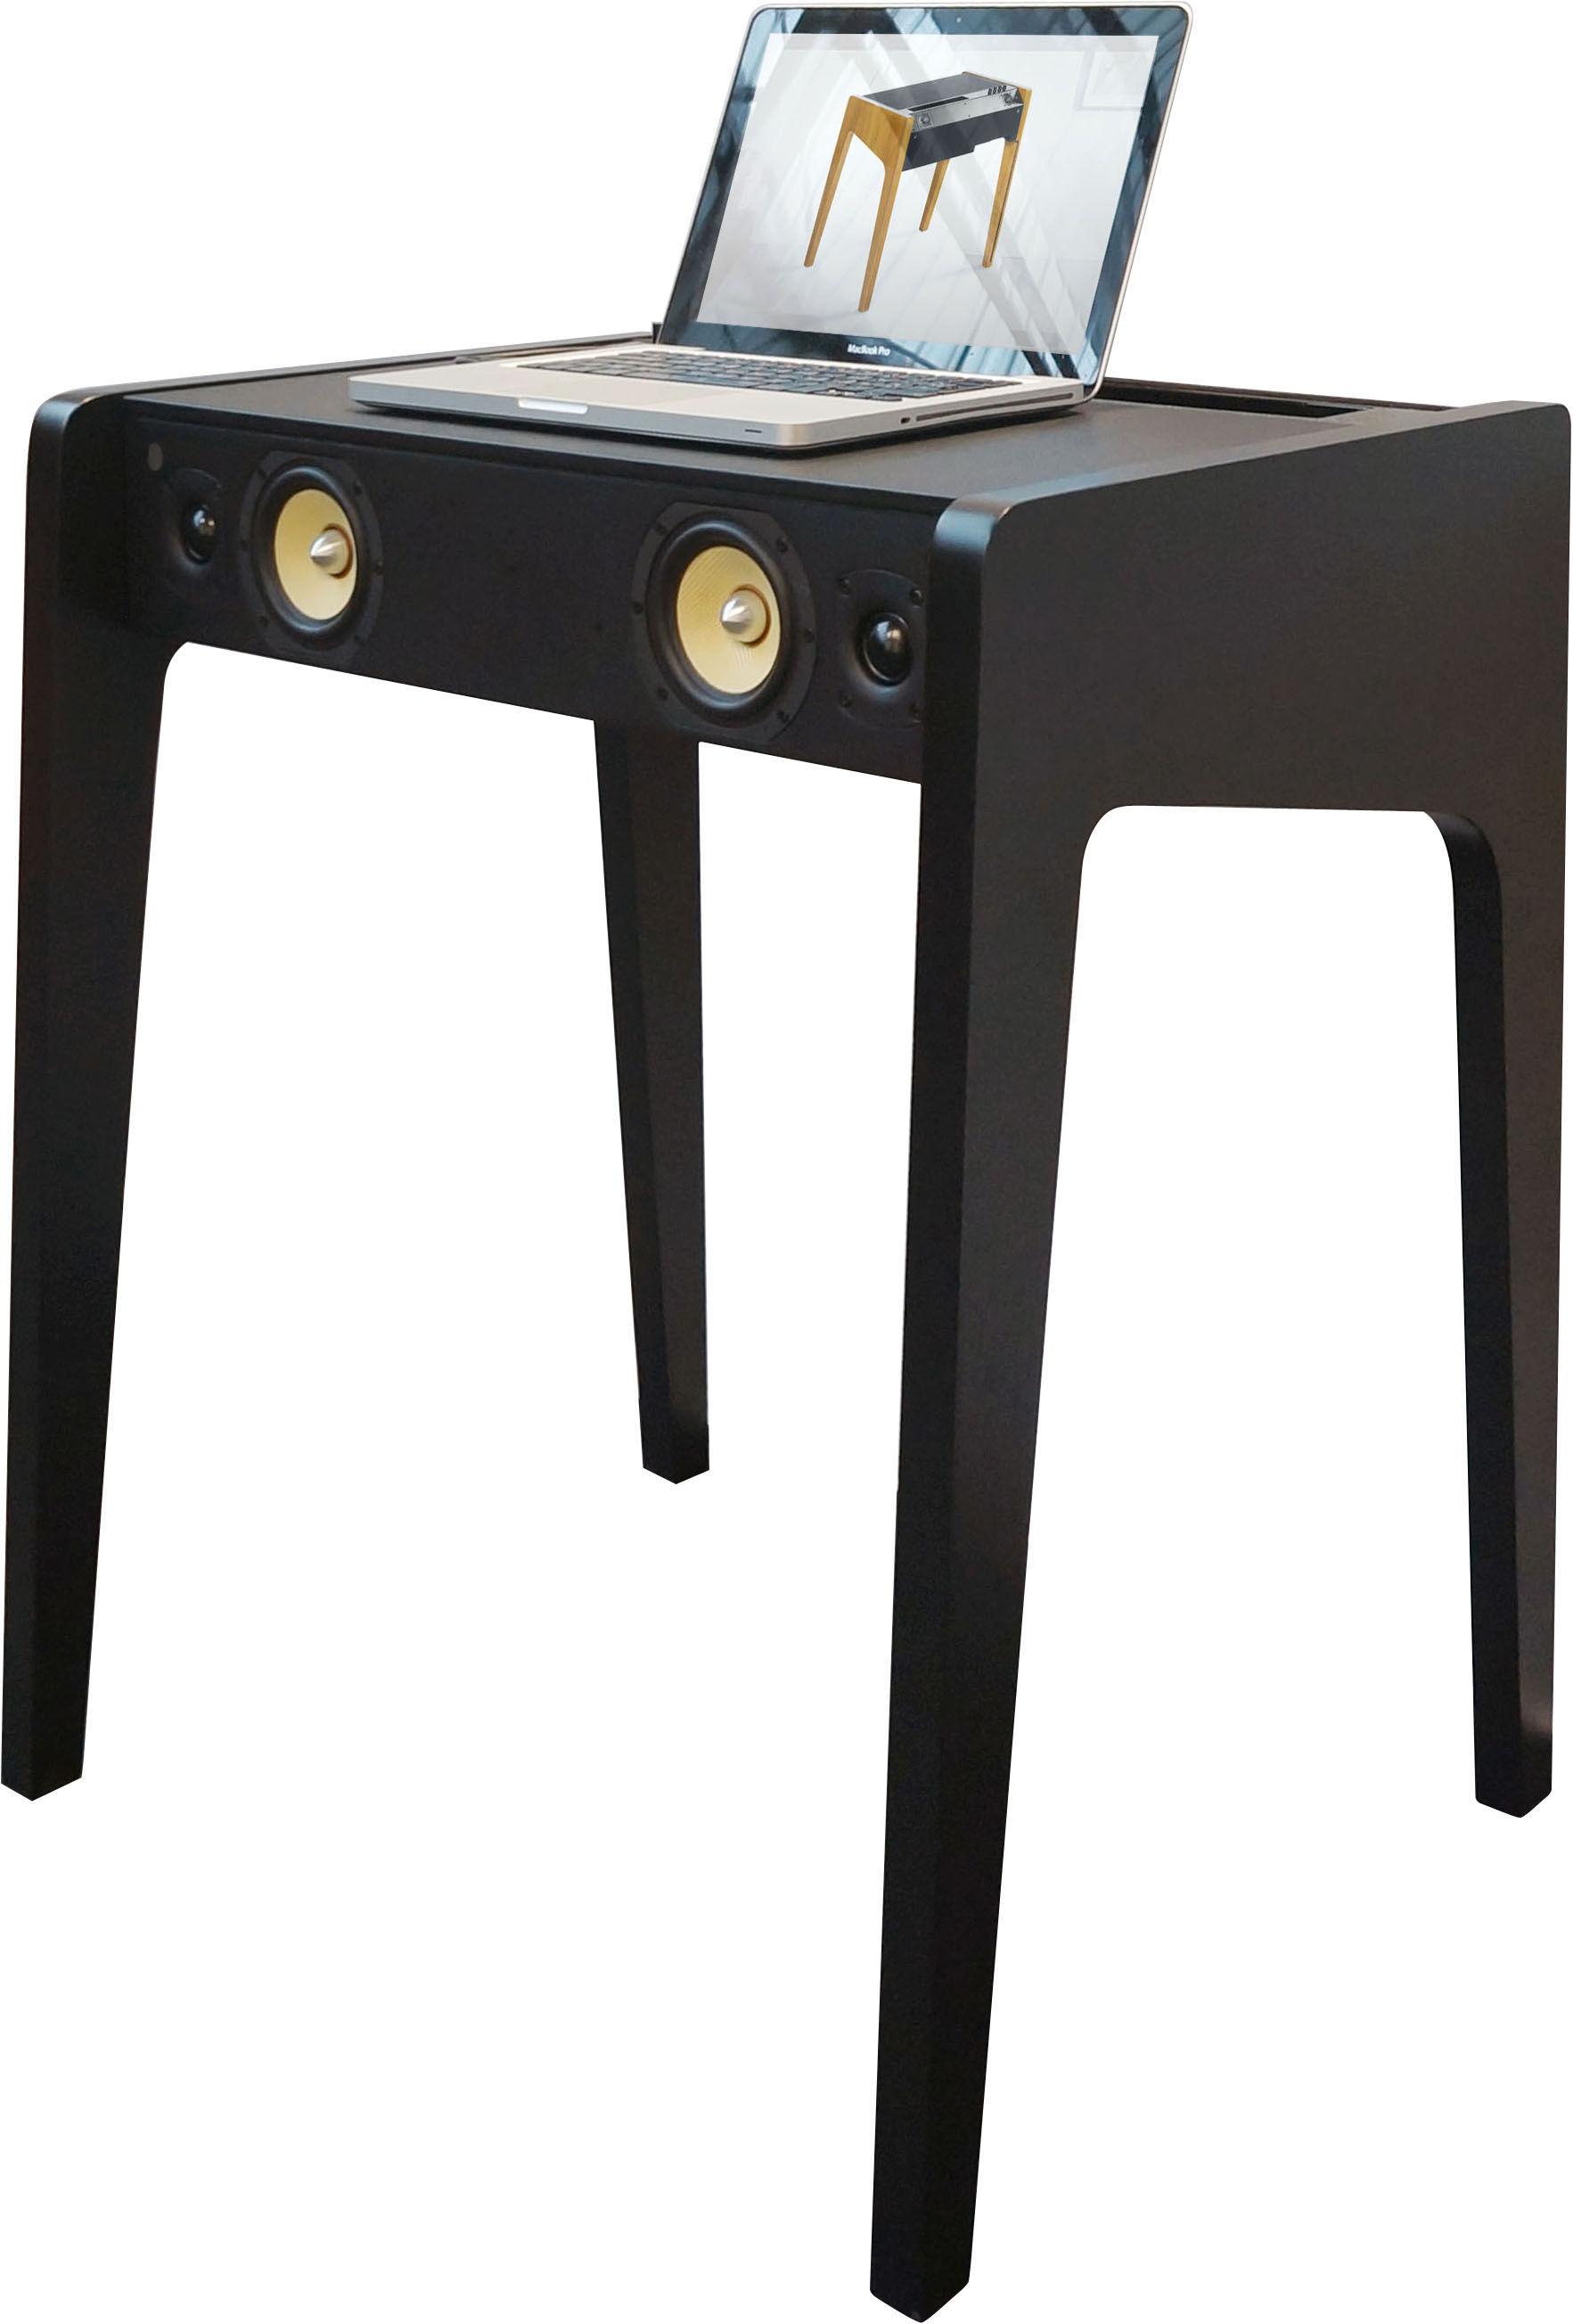 Furniture - Console Tables - LD 130 Bluetooth speaker - Laptop, iPhone & iPod compatible - W 69 cm by La Boîte Concept - Matt black - Leather, MDF